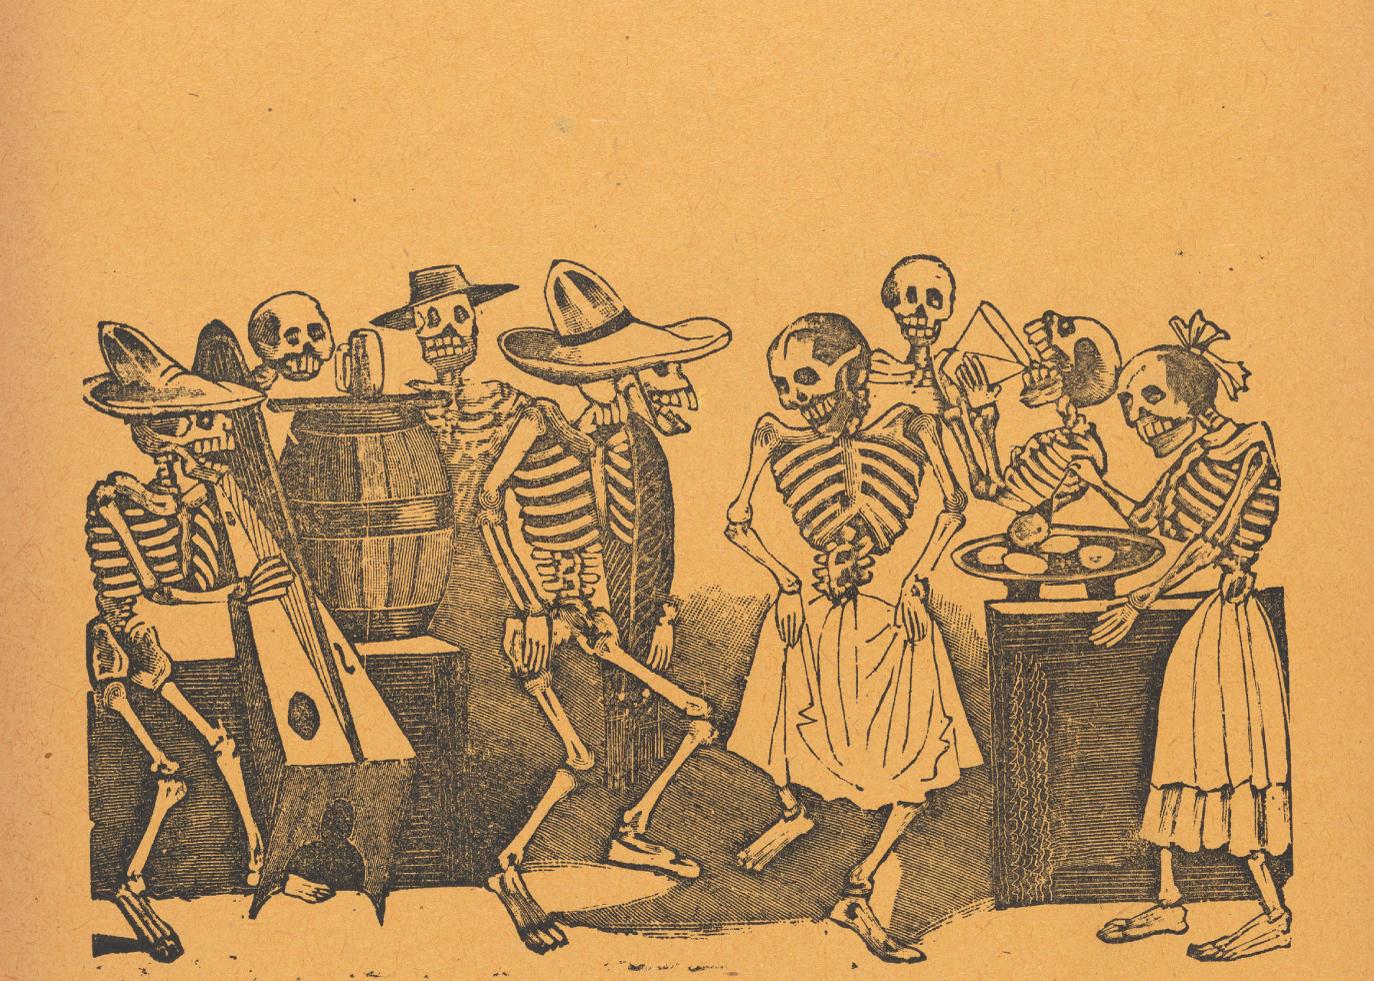 danse macabre article banner